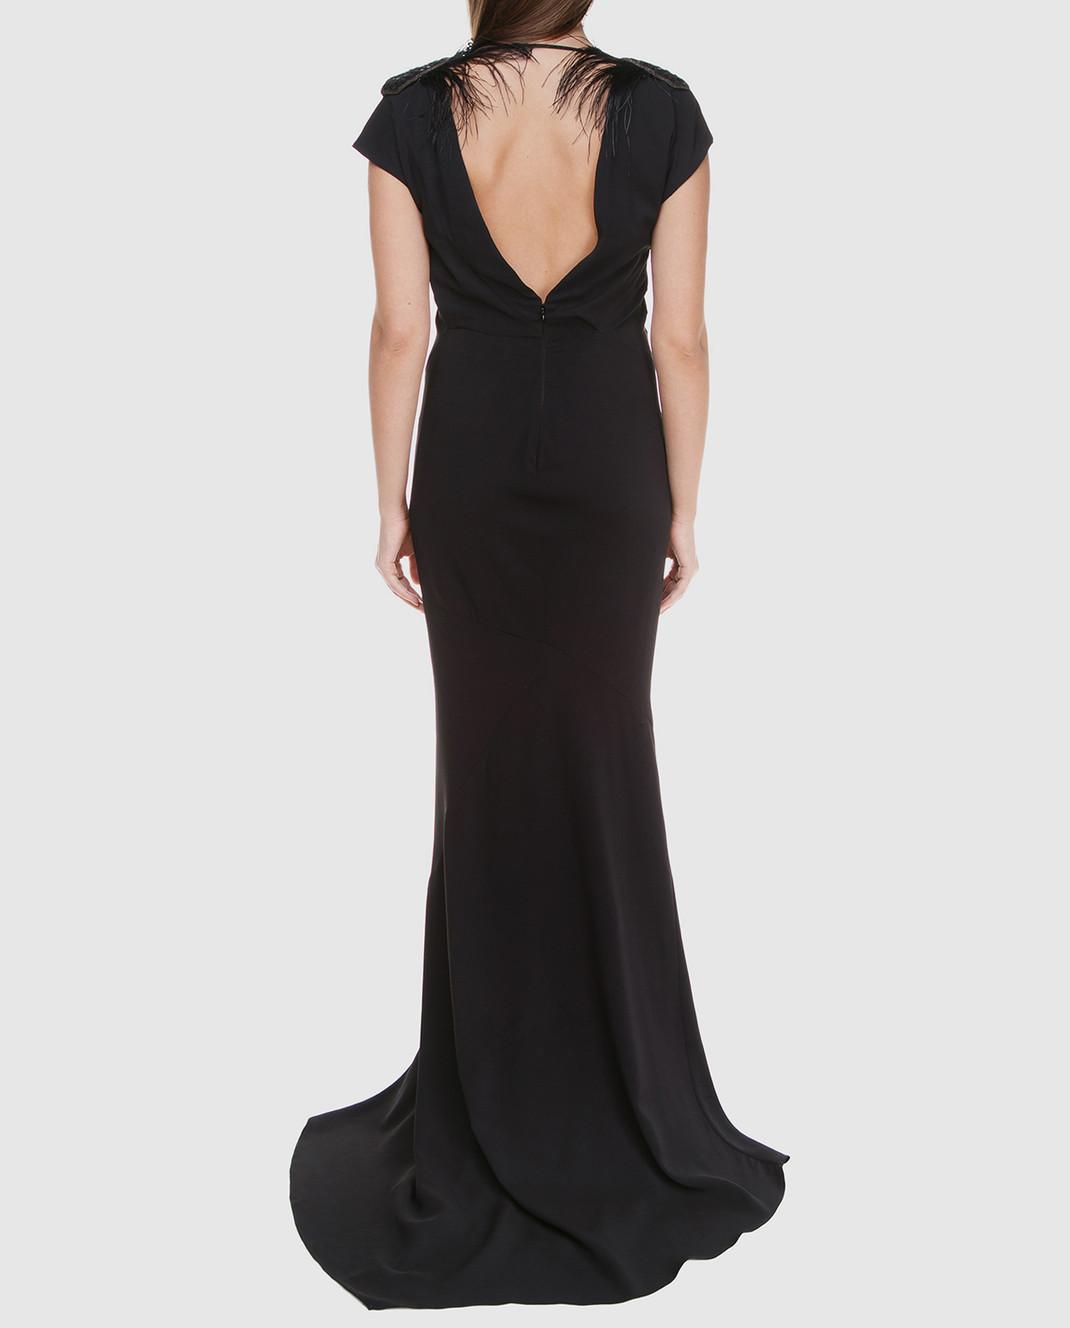 Brunello Cucinelli Черное платье MA970AE661 изображение 4